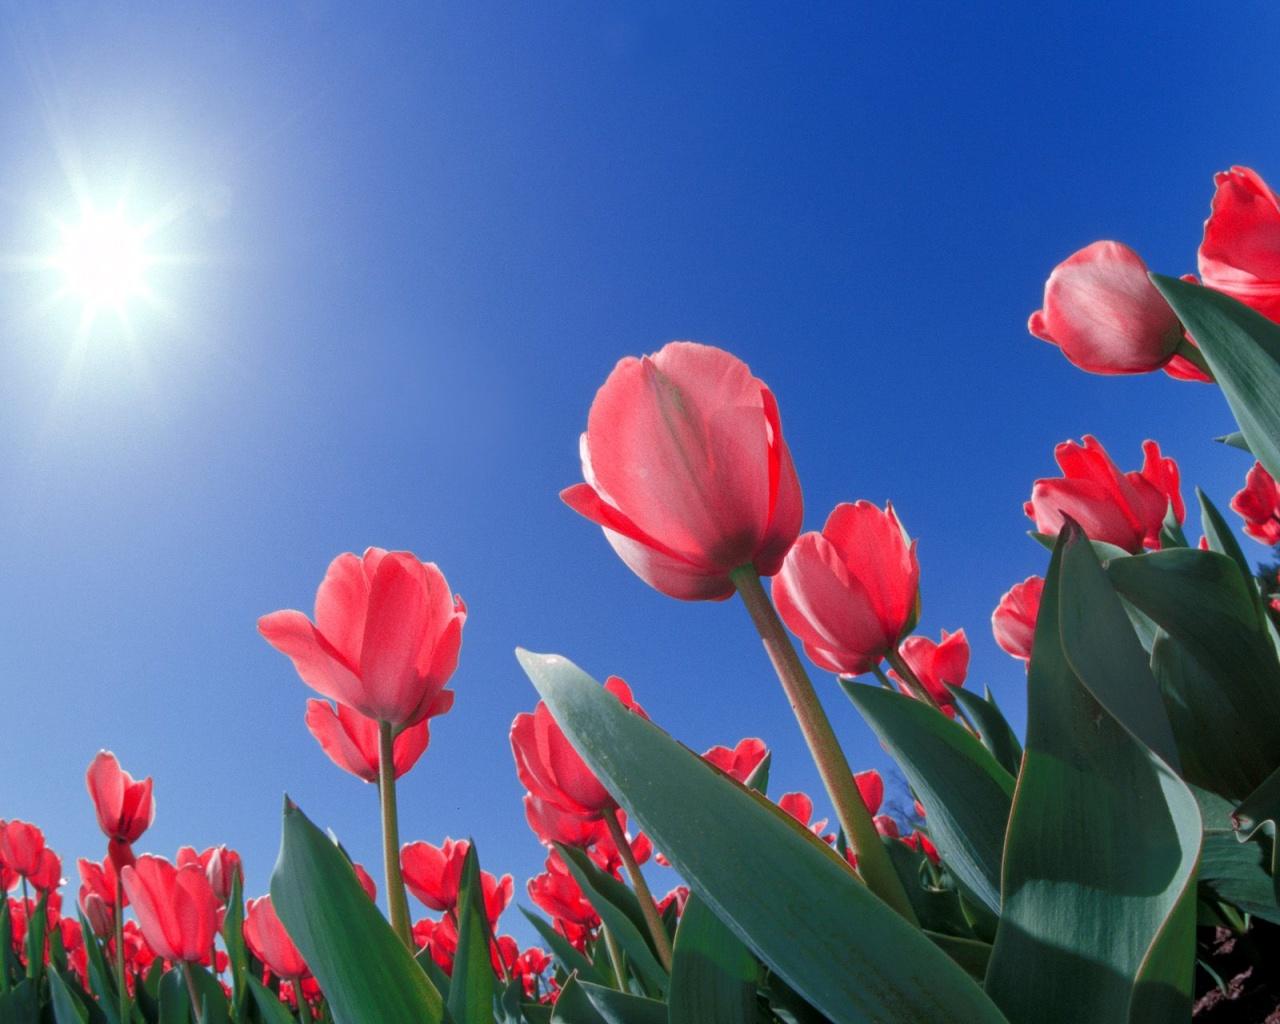 Red Tulips Cincinnati Ohio Wallpapers HD Wallpapers 1280x1024